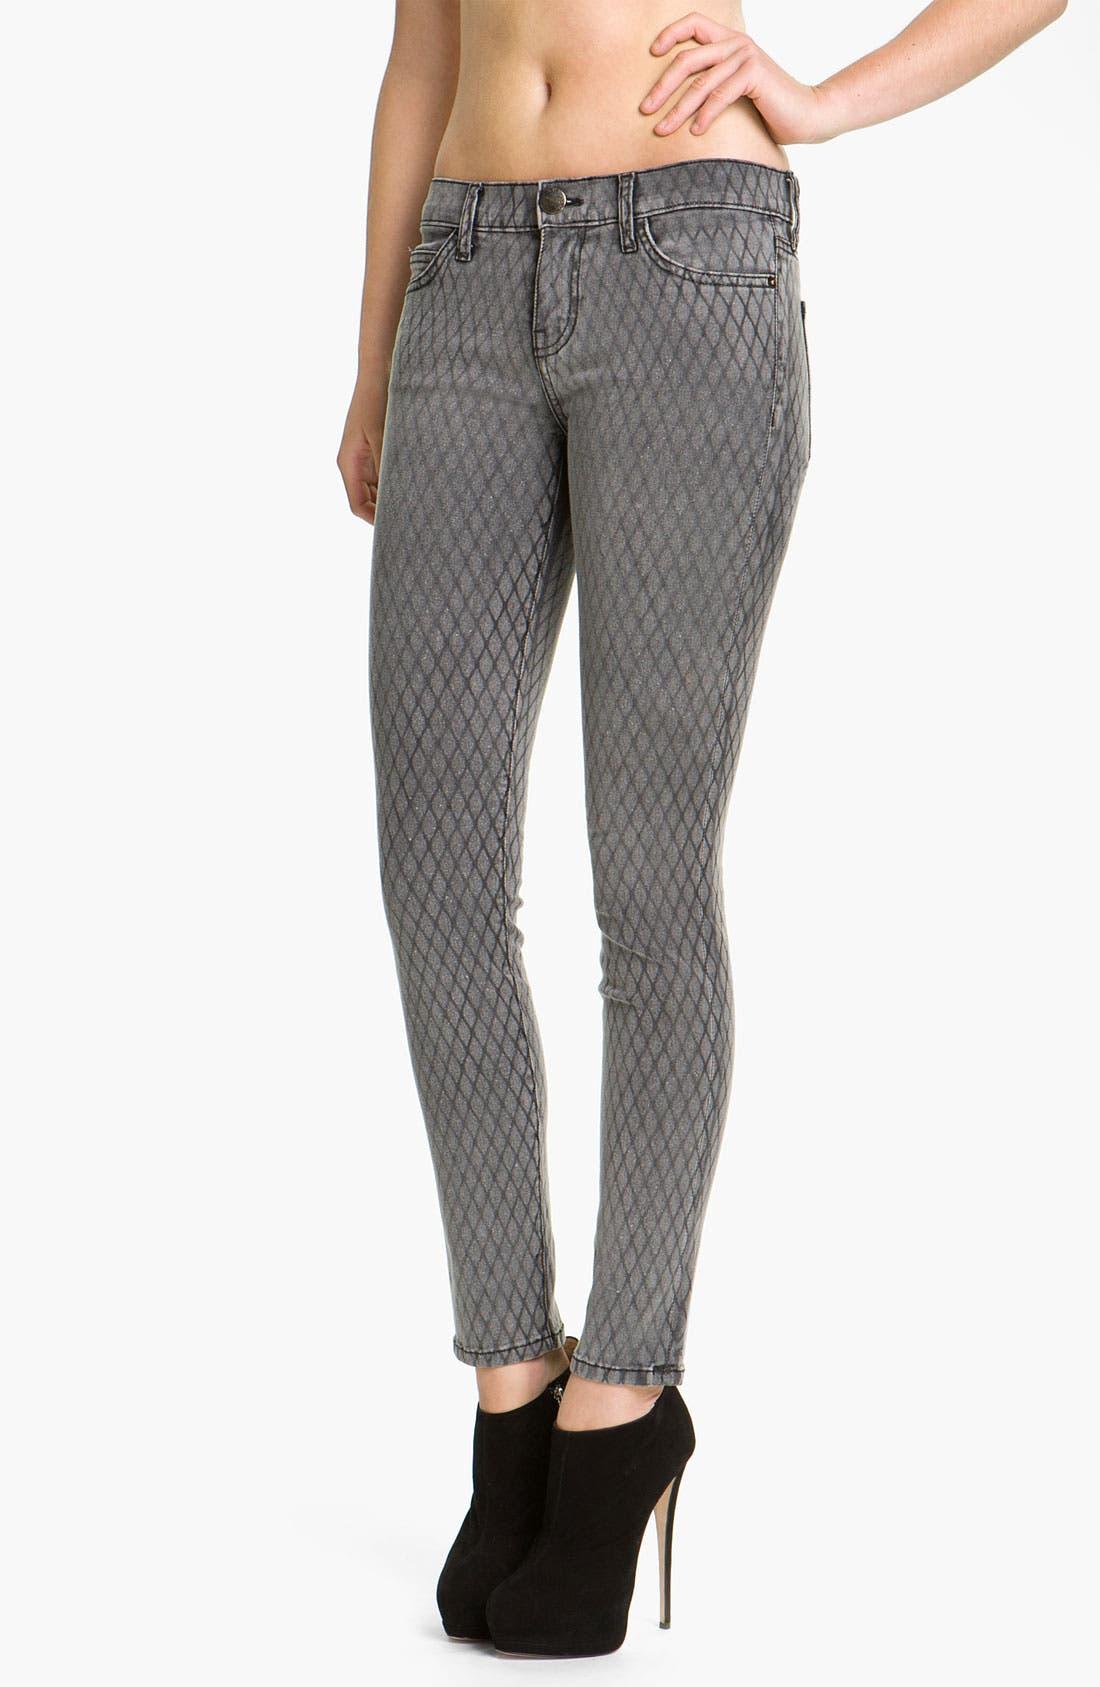 Main Image - Current/Elliott Print Stretch Skinny Jeans (Fishnet)